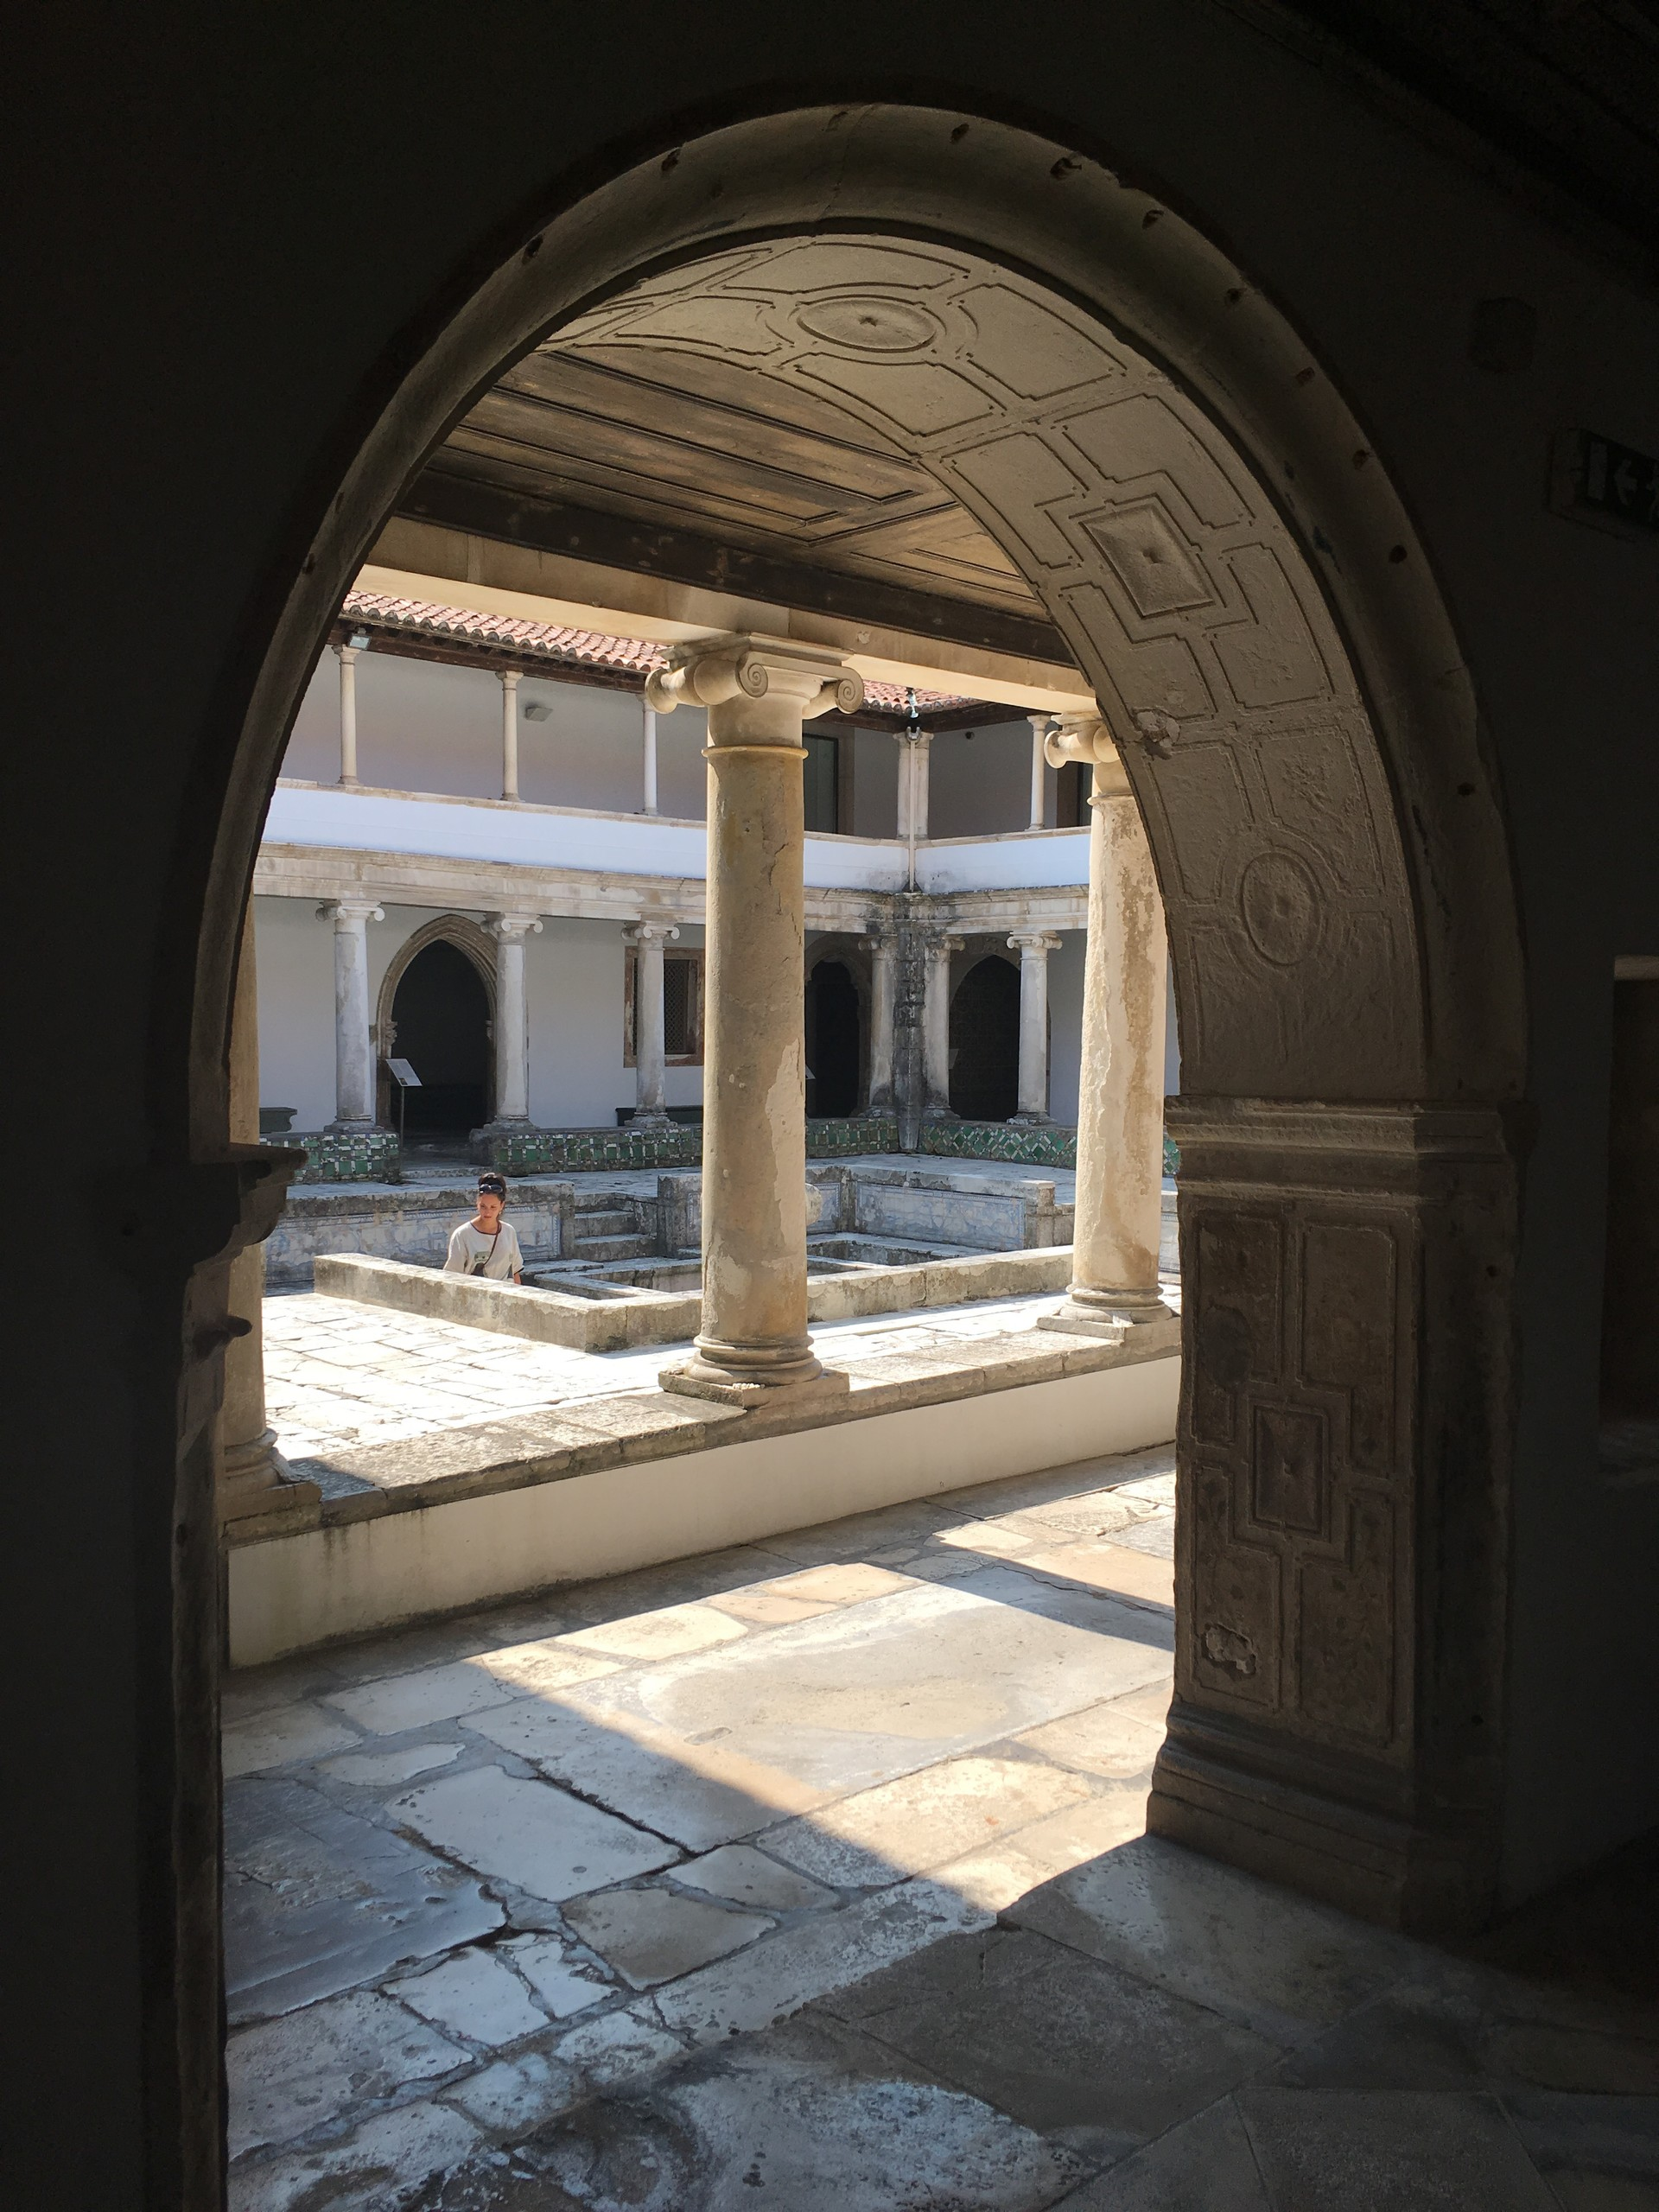 Historic place